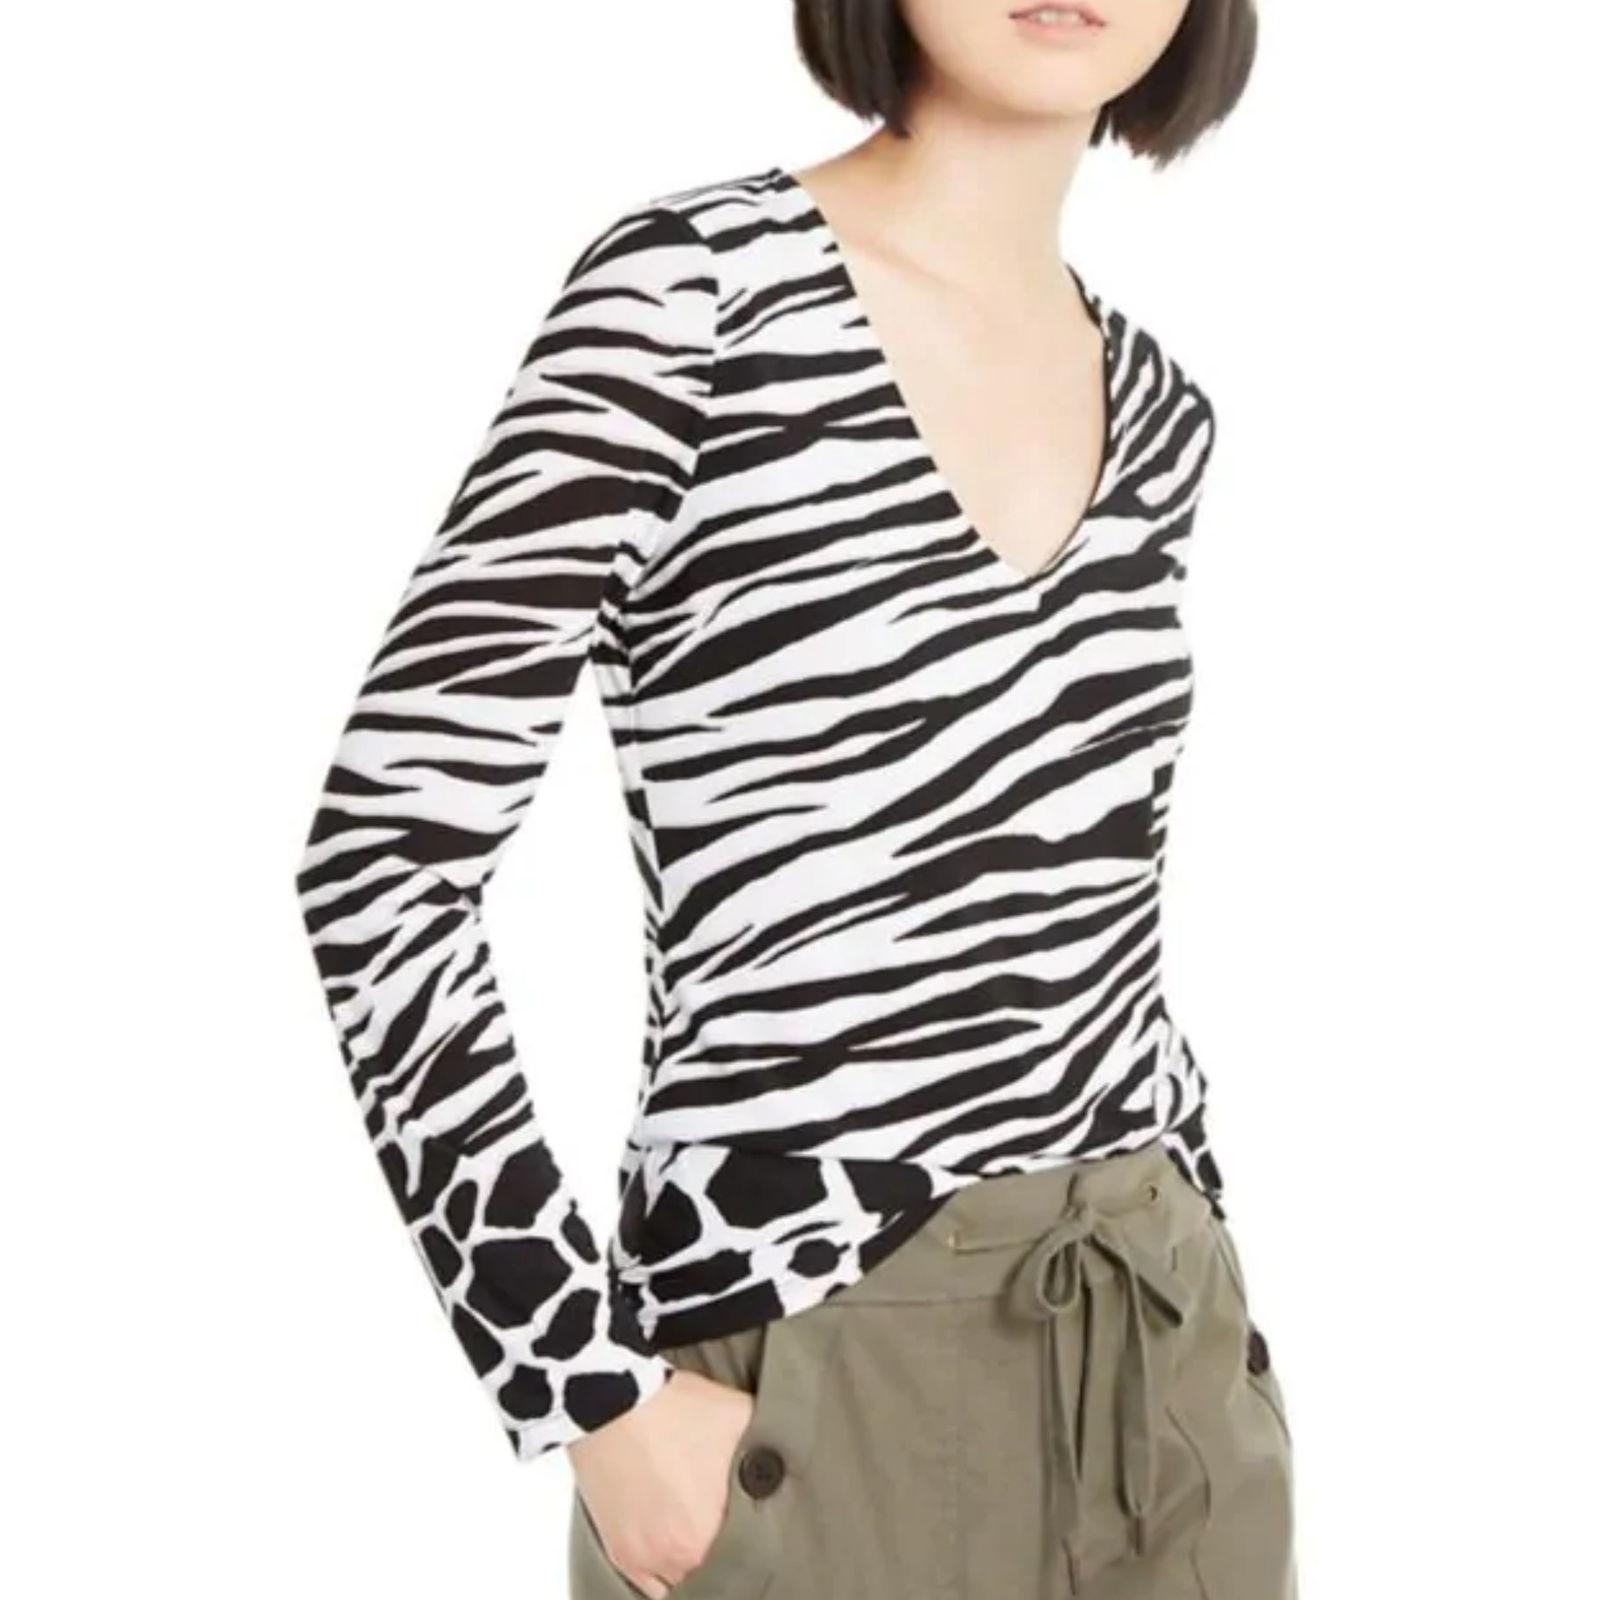 nwt Zebra Print Top Petite white/black L